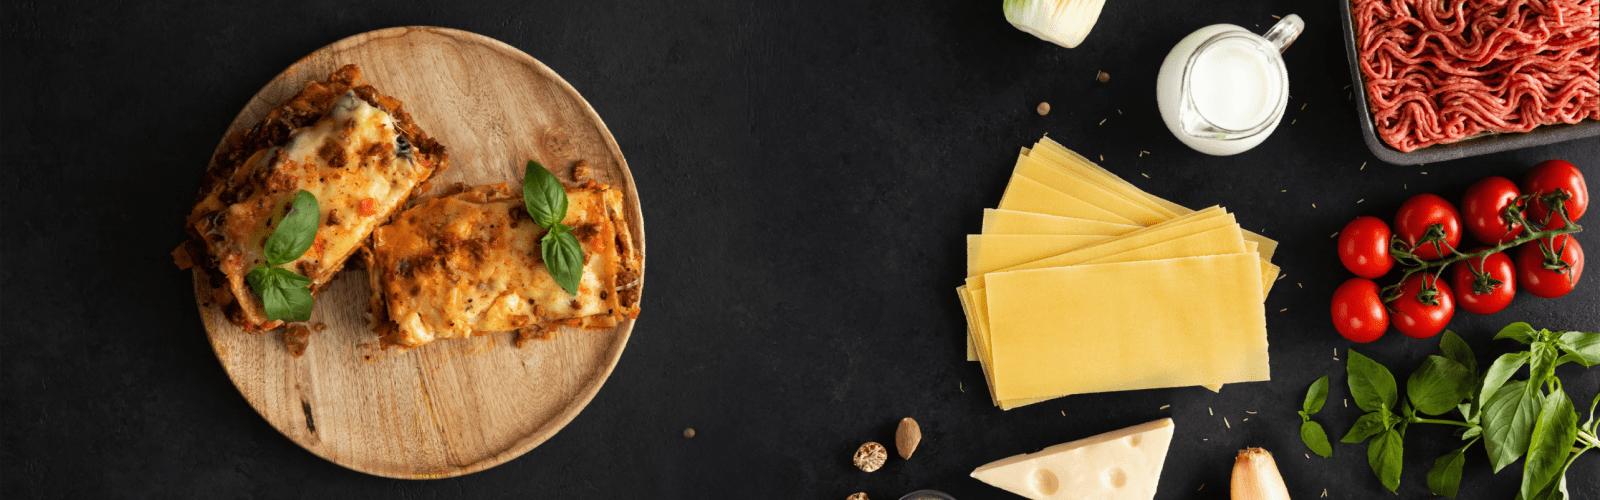 veggie lasagna and ingredients